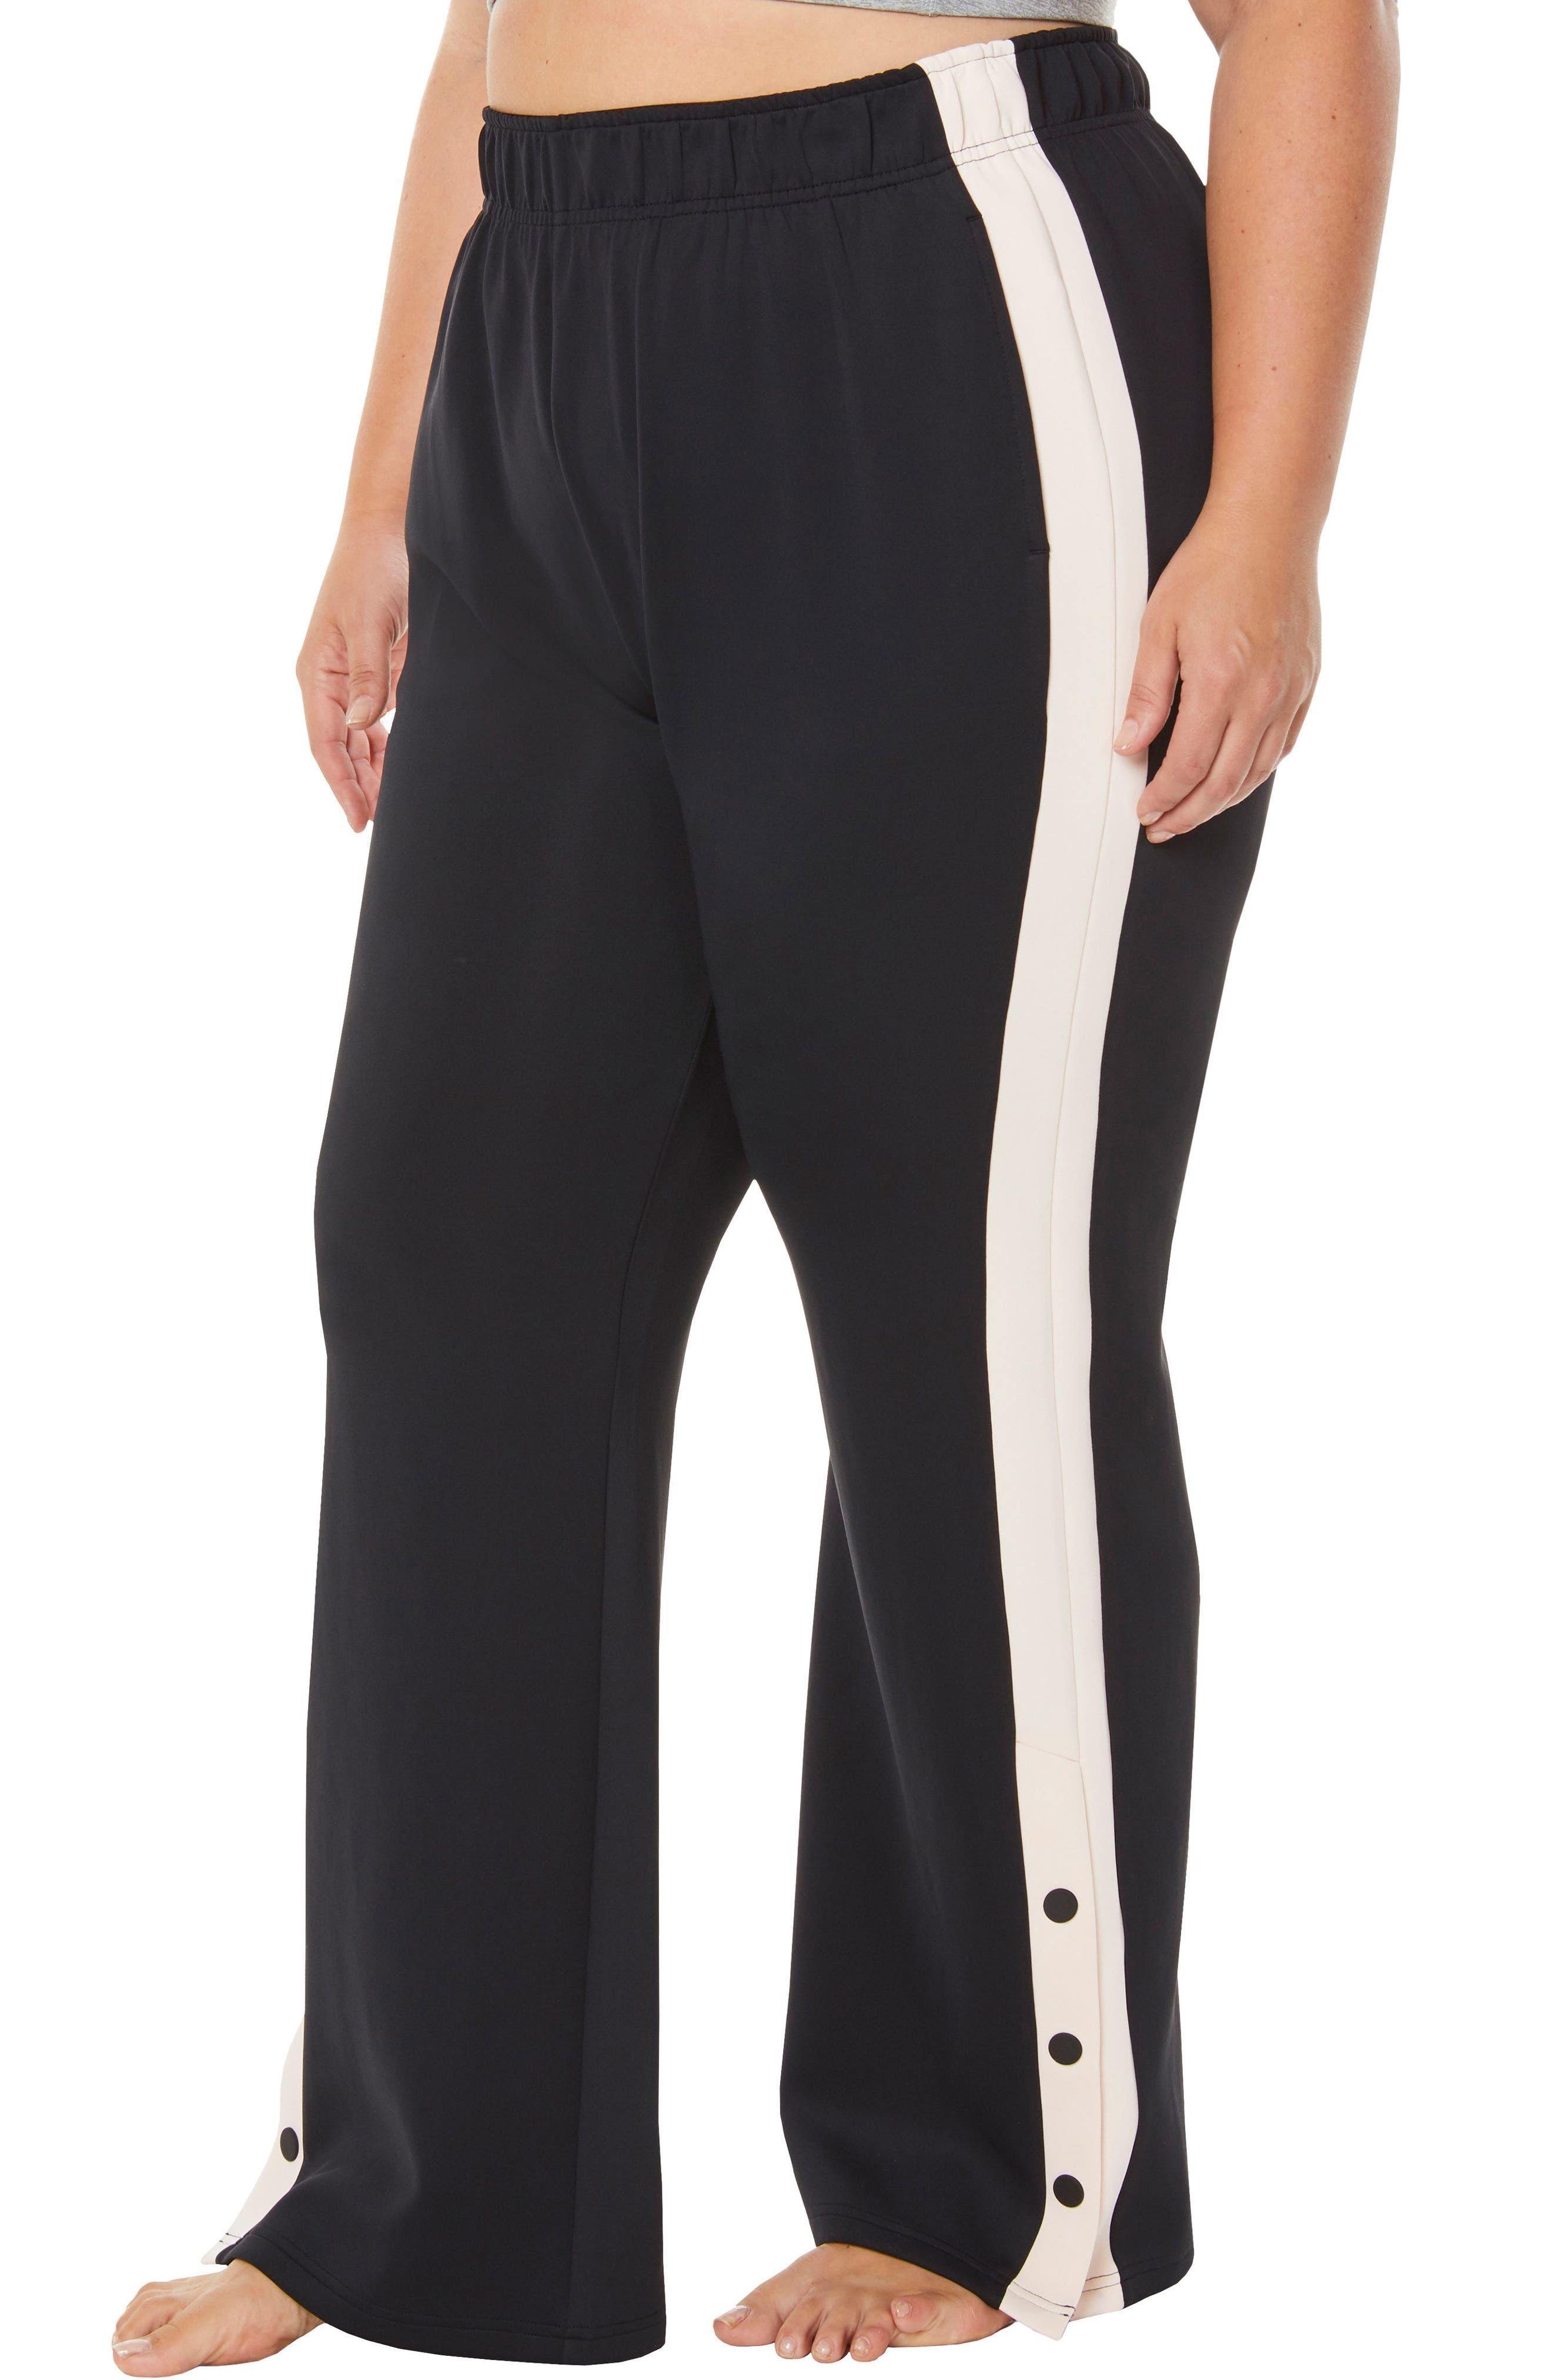 Shape Snappy Pants,                             Alternate thumbnail 9, color,                             002